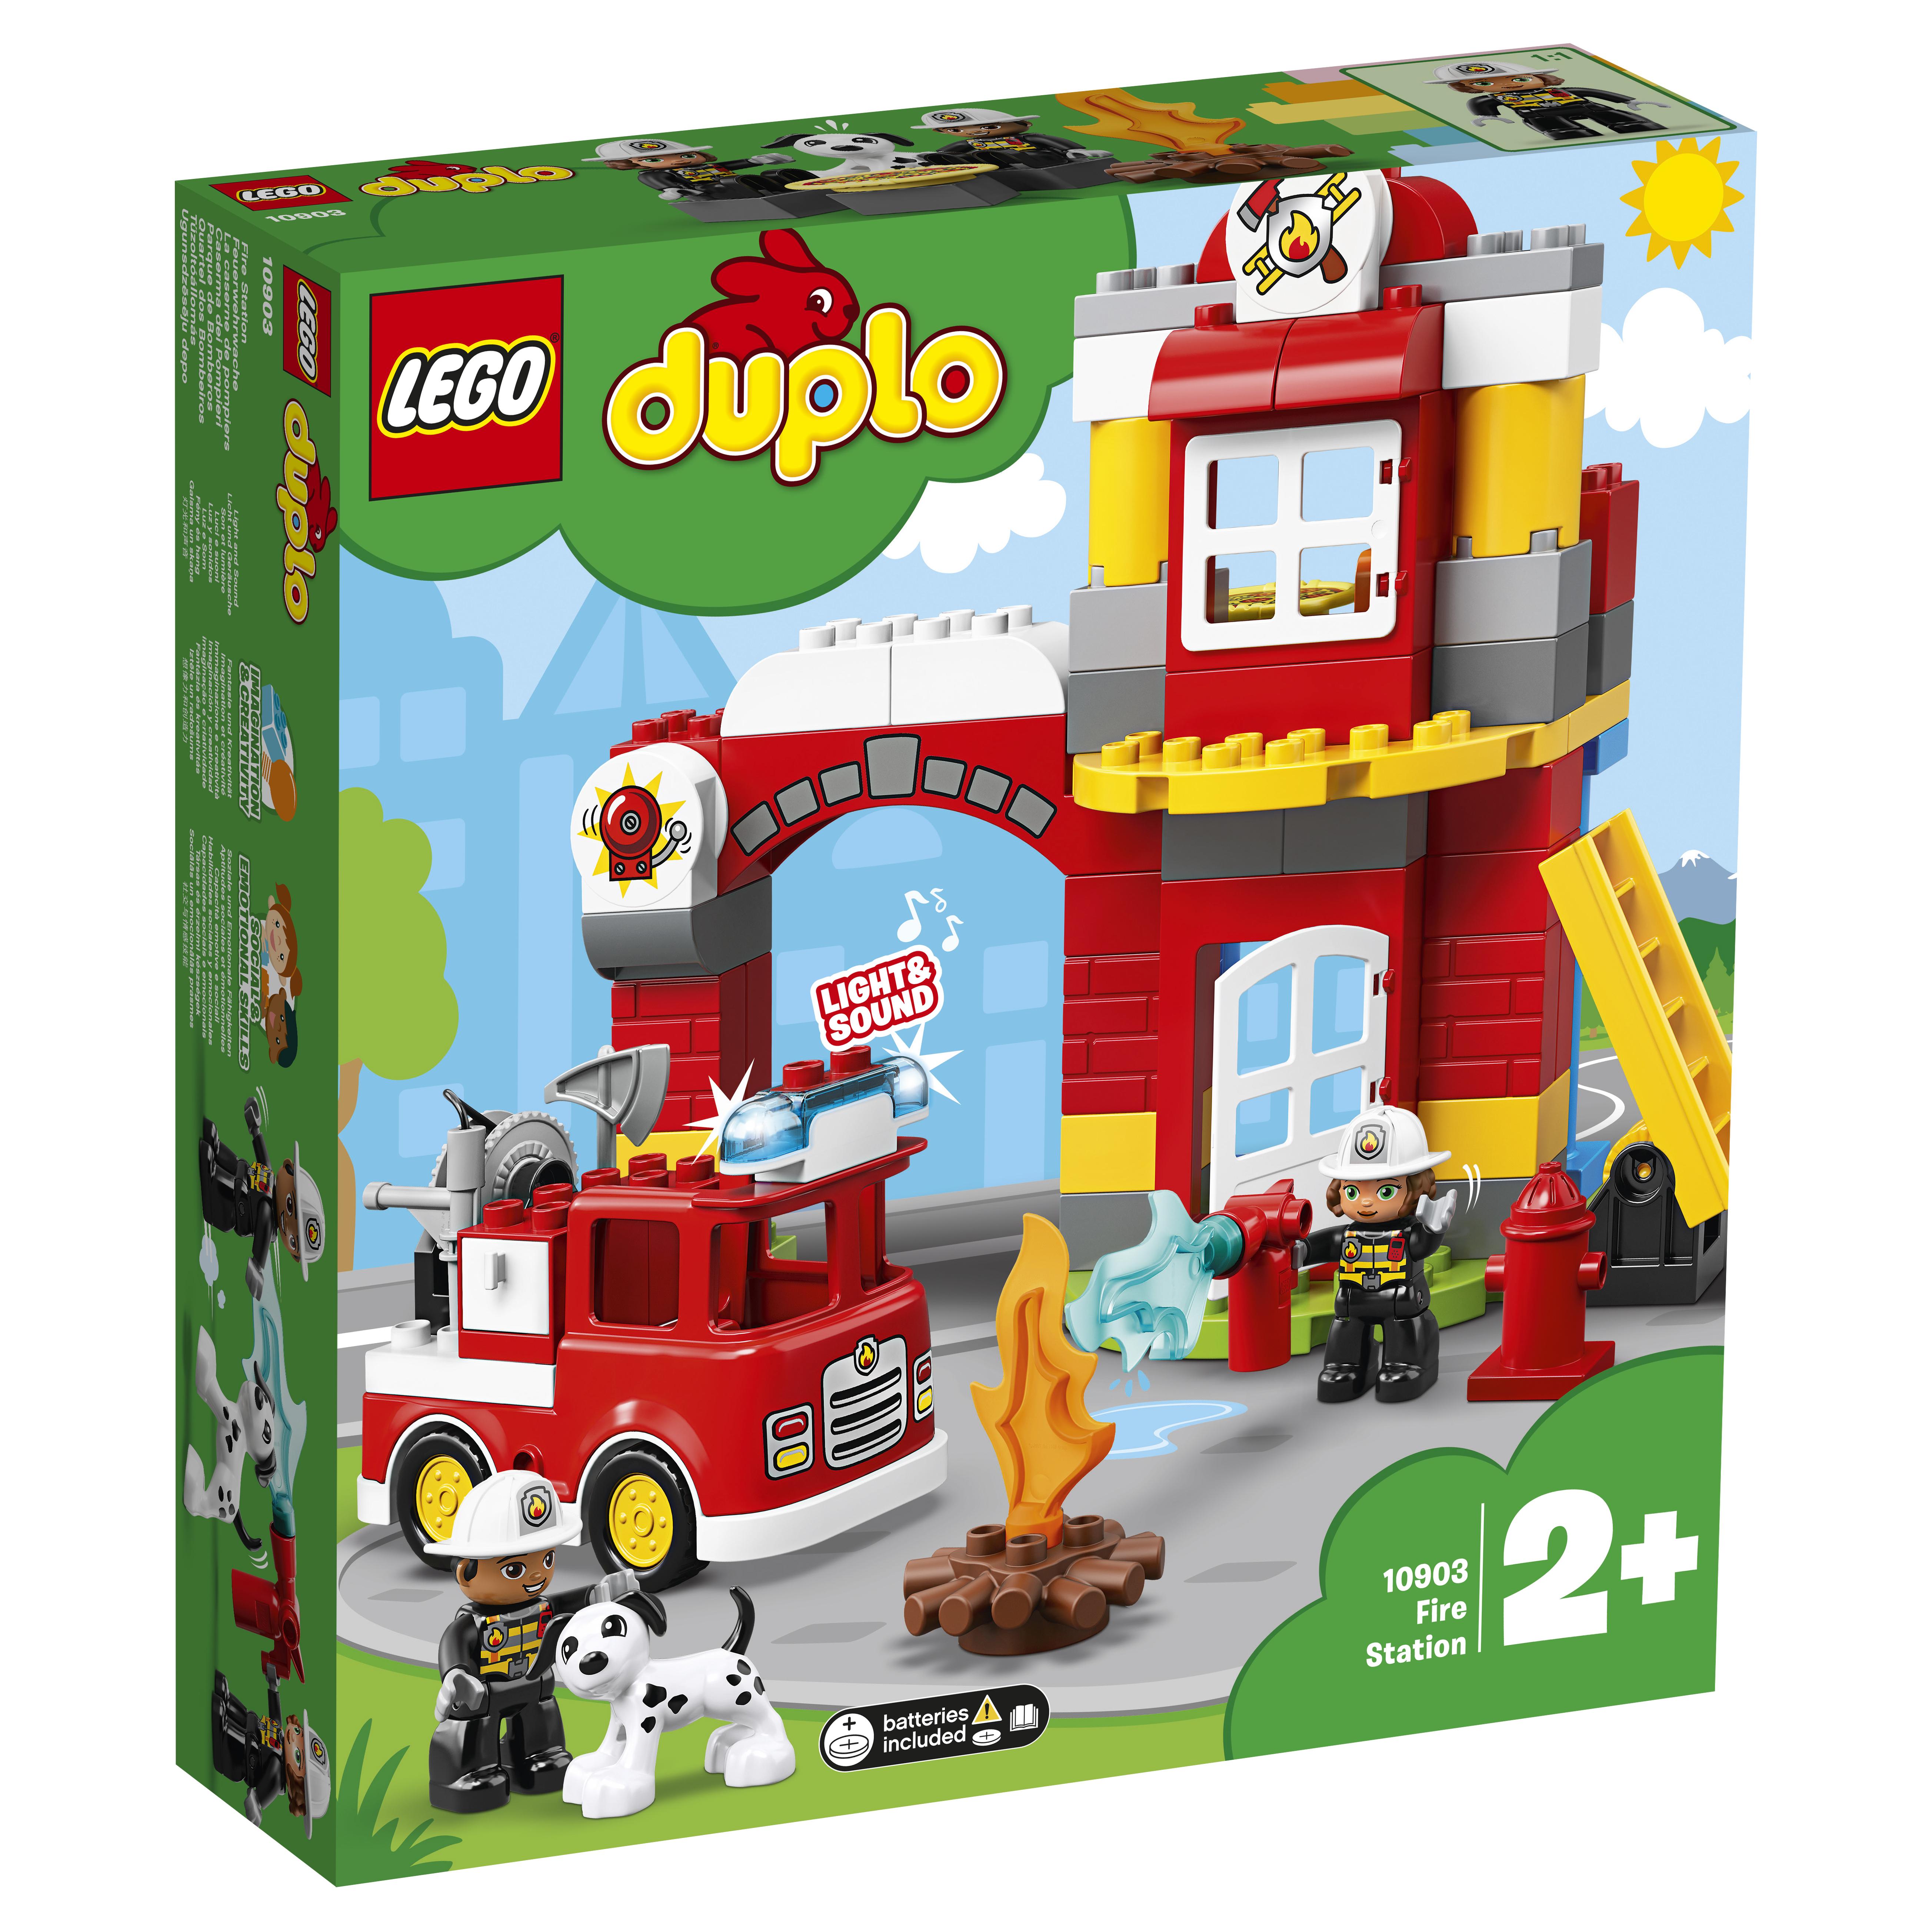 LEGO DUPLO LEGO Конструктор LEGO DUPLO Town 10903 Пожарное депо